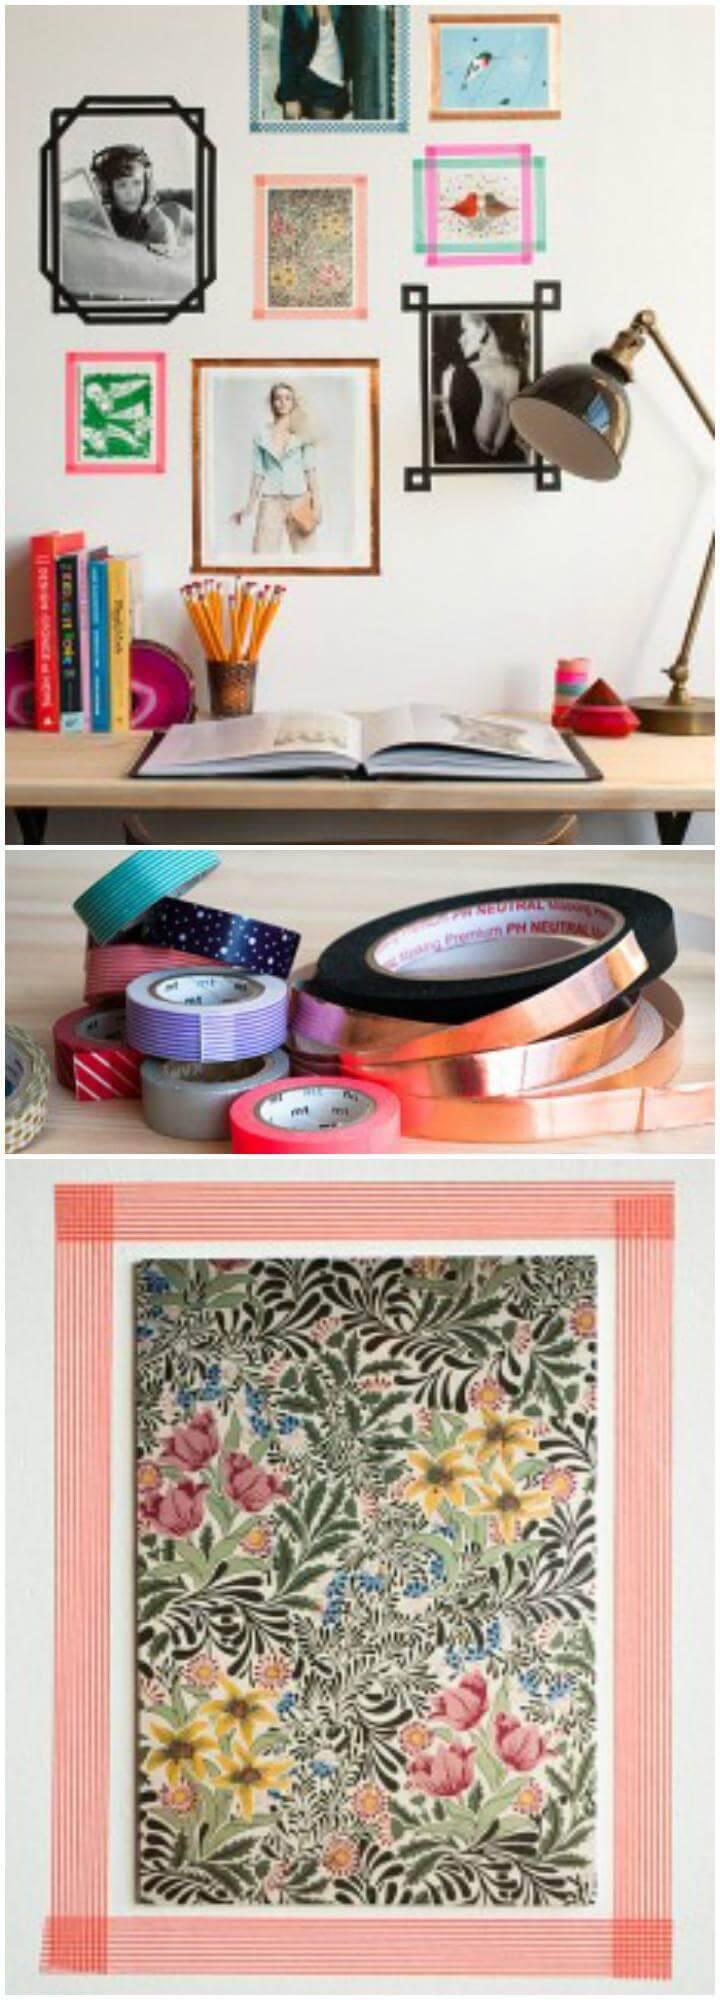 DIY Tape Wall Photo Frames